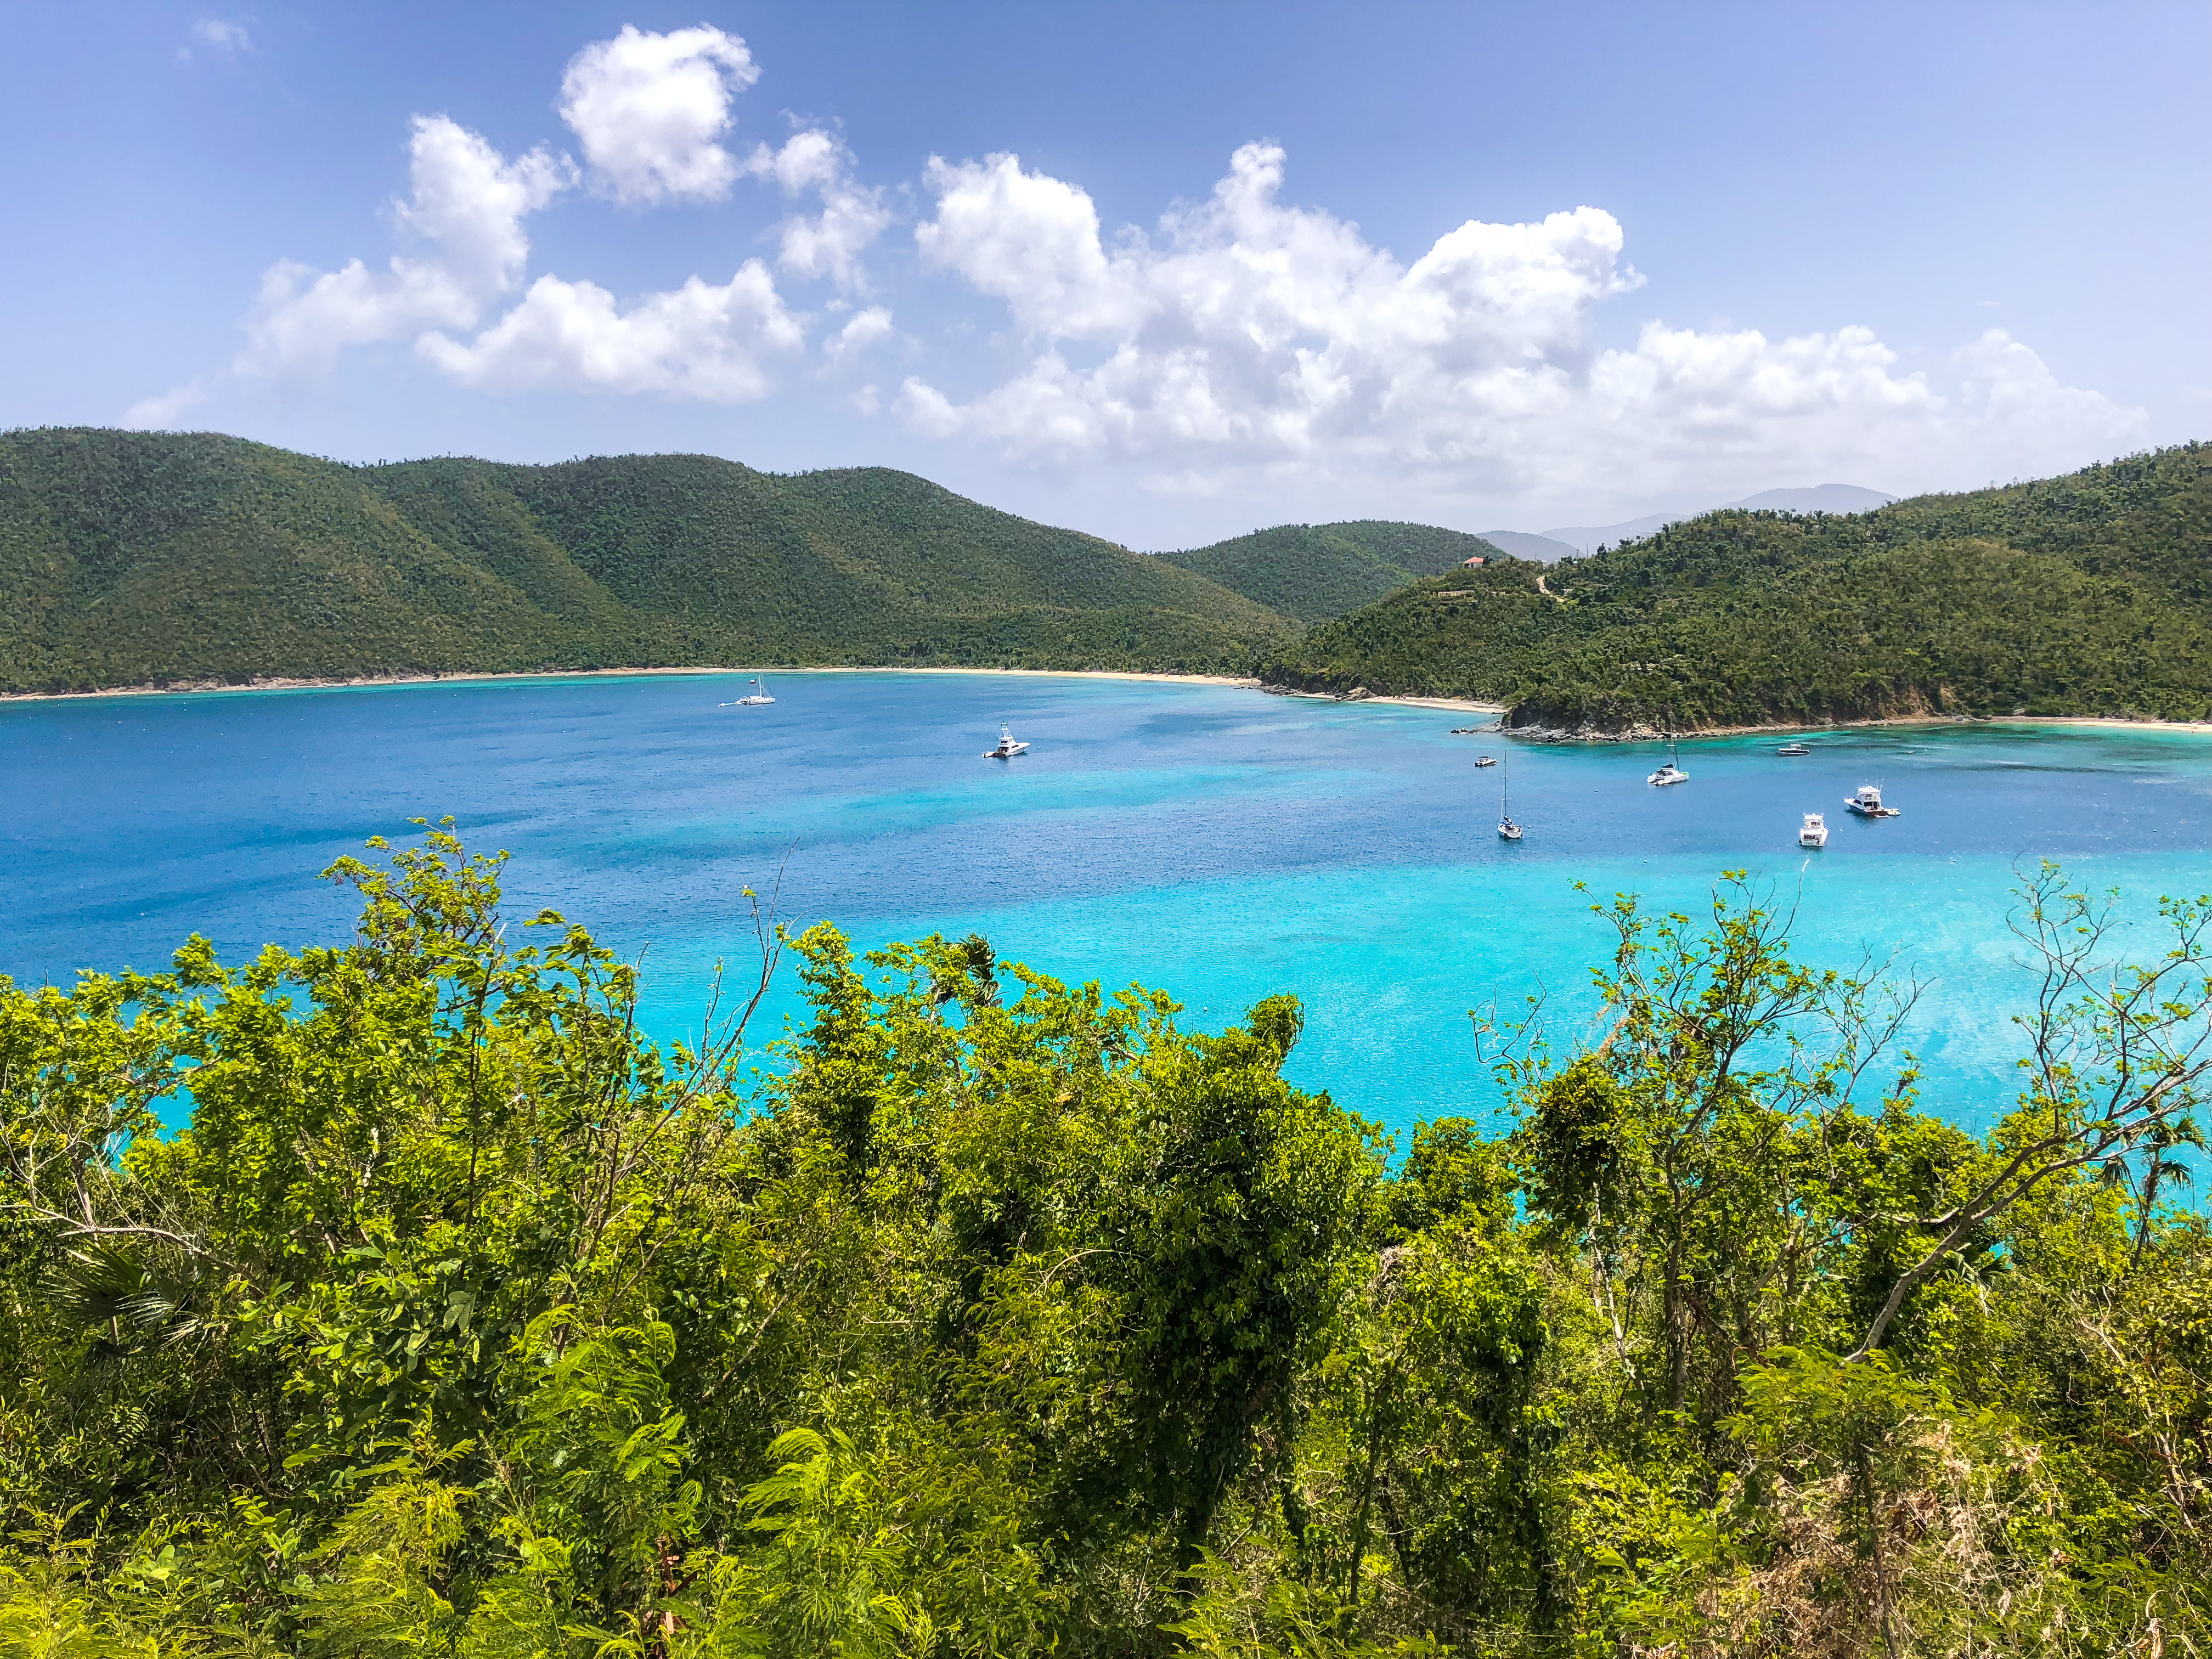 St John US Virgin Islands 3 Days - The Weekend Jetsetter